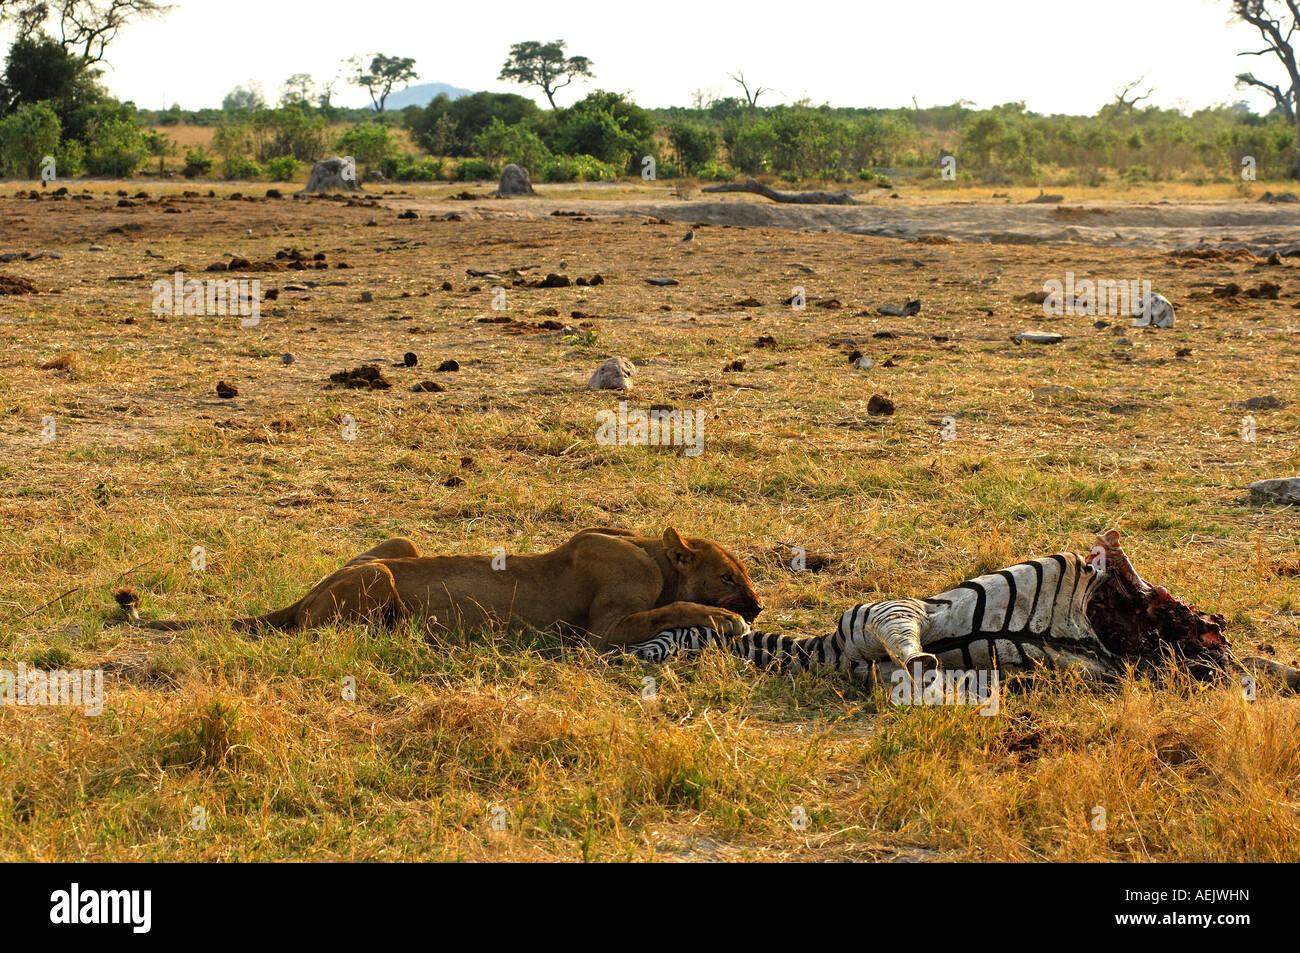 Lioness at a Zebra kill, Savuti Narional Park, Botswana Stock Photo